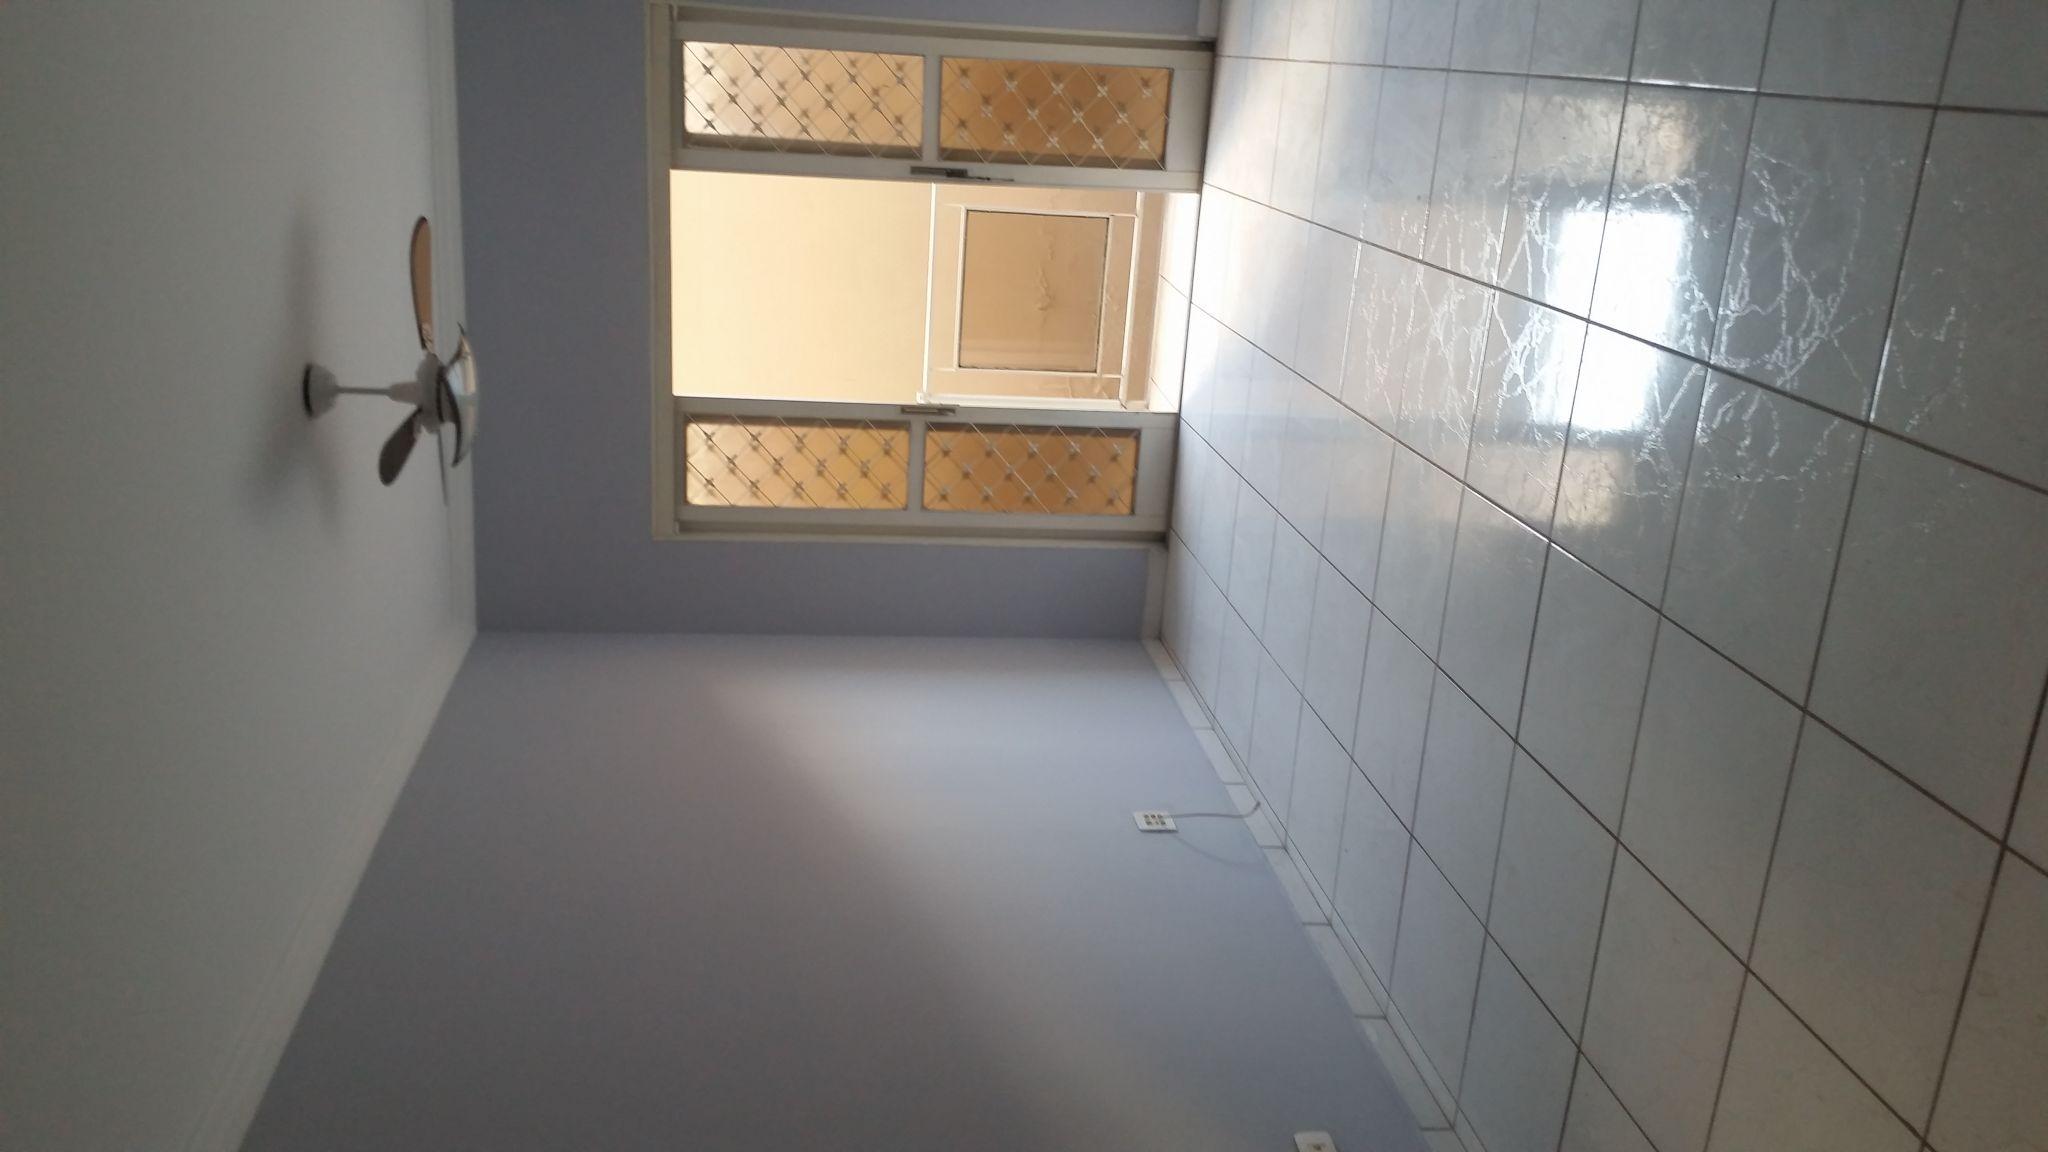 325 - Apto Jardim Paulistano 94 m²